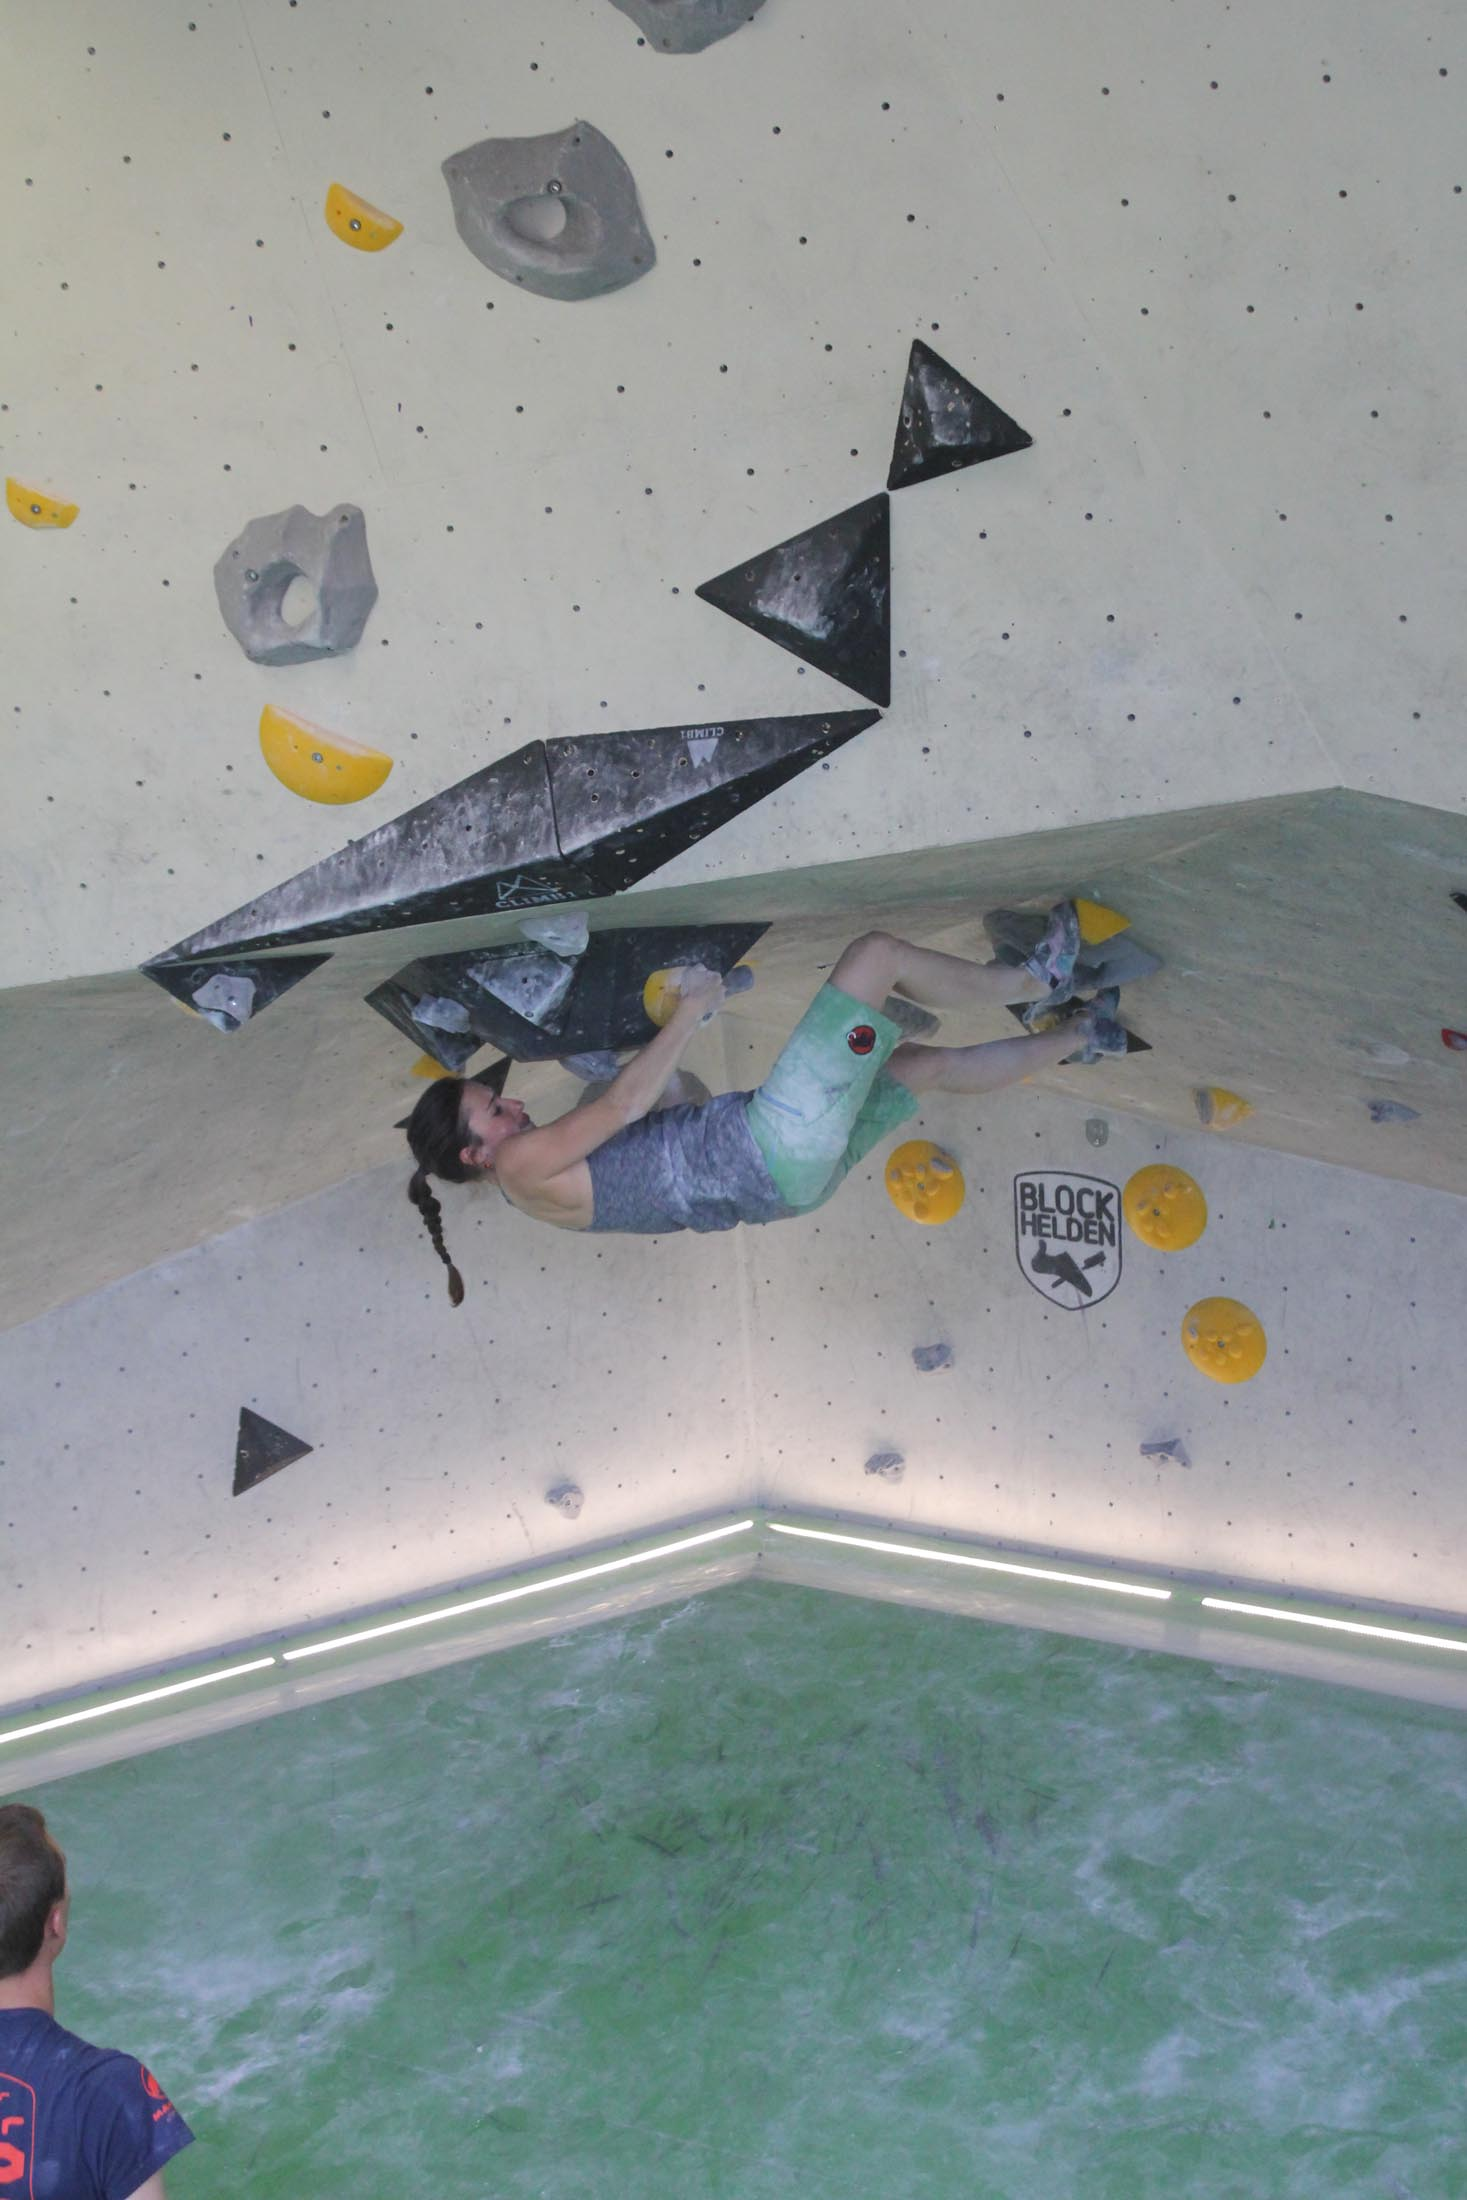 Juliane Wurm, internationaler bouldercup Frankenjura, BLOCKHELDEN Erlangen, Bergfreunde.de, Mammut07092016012